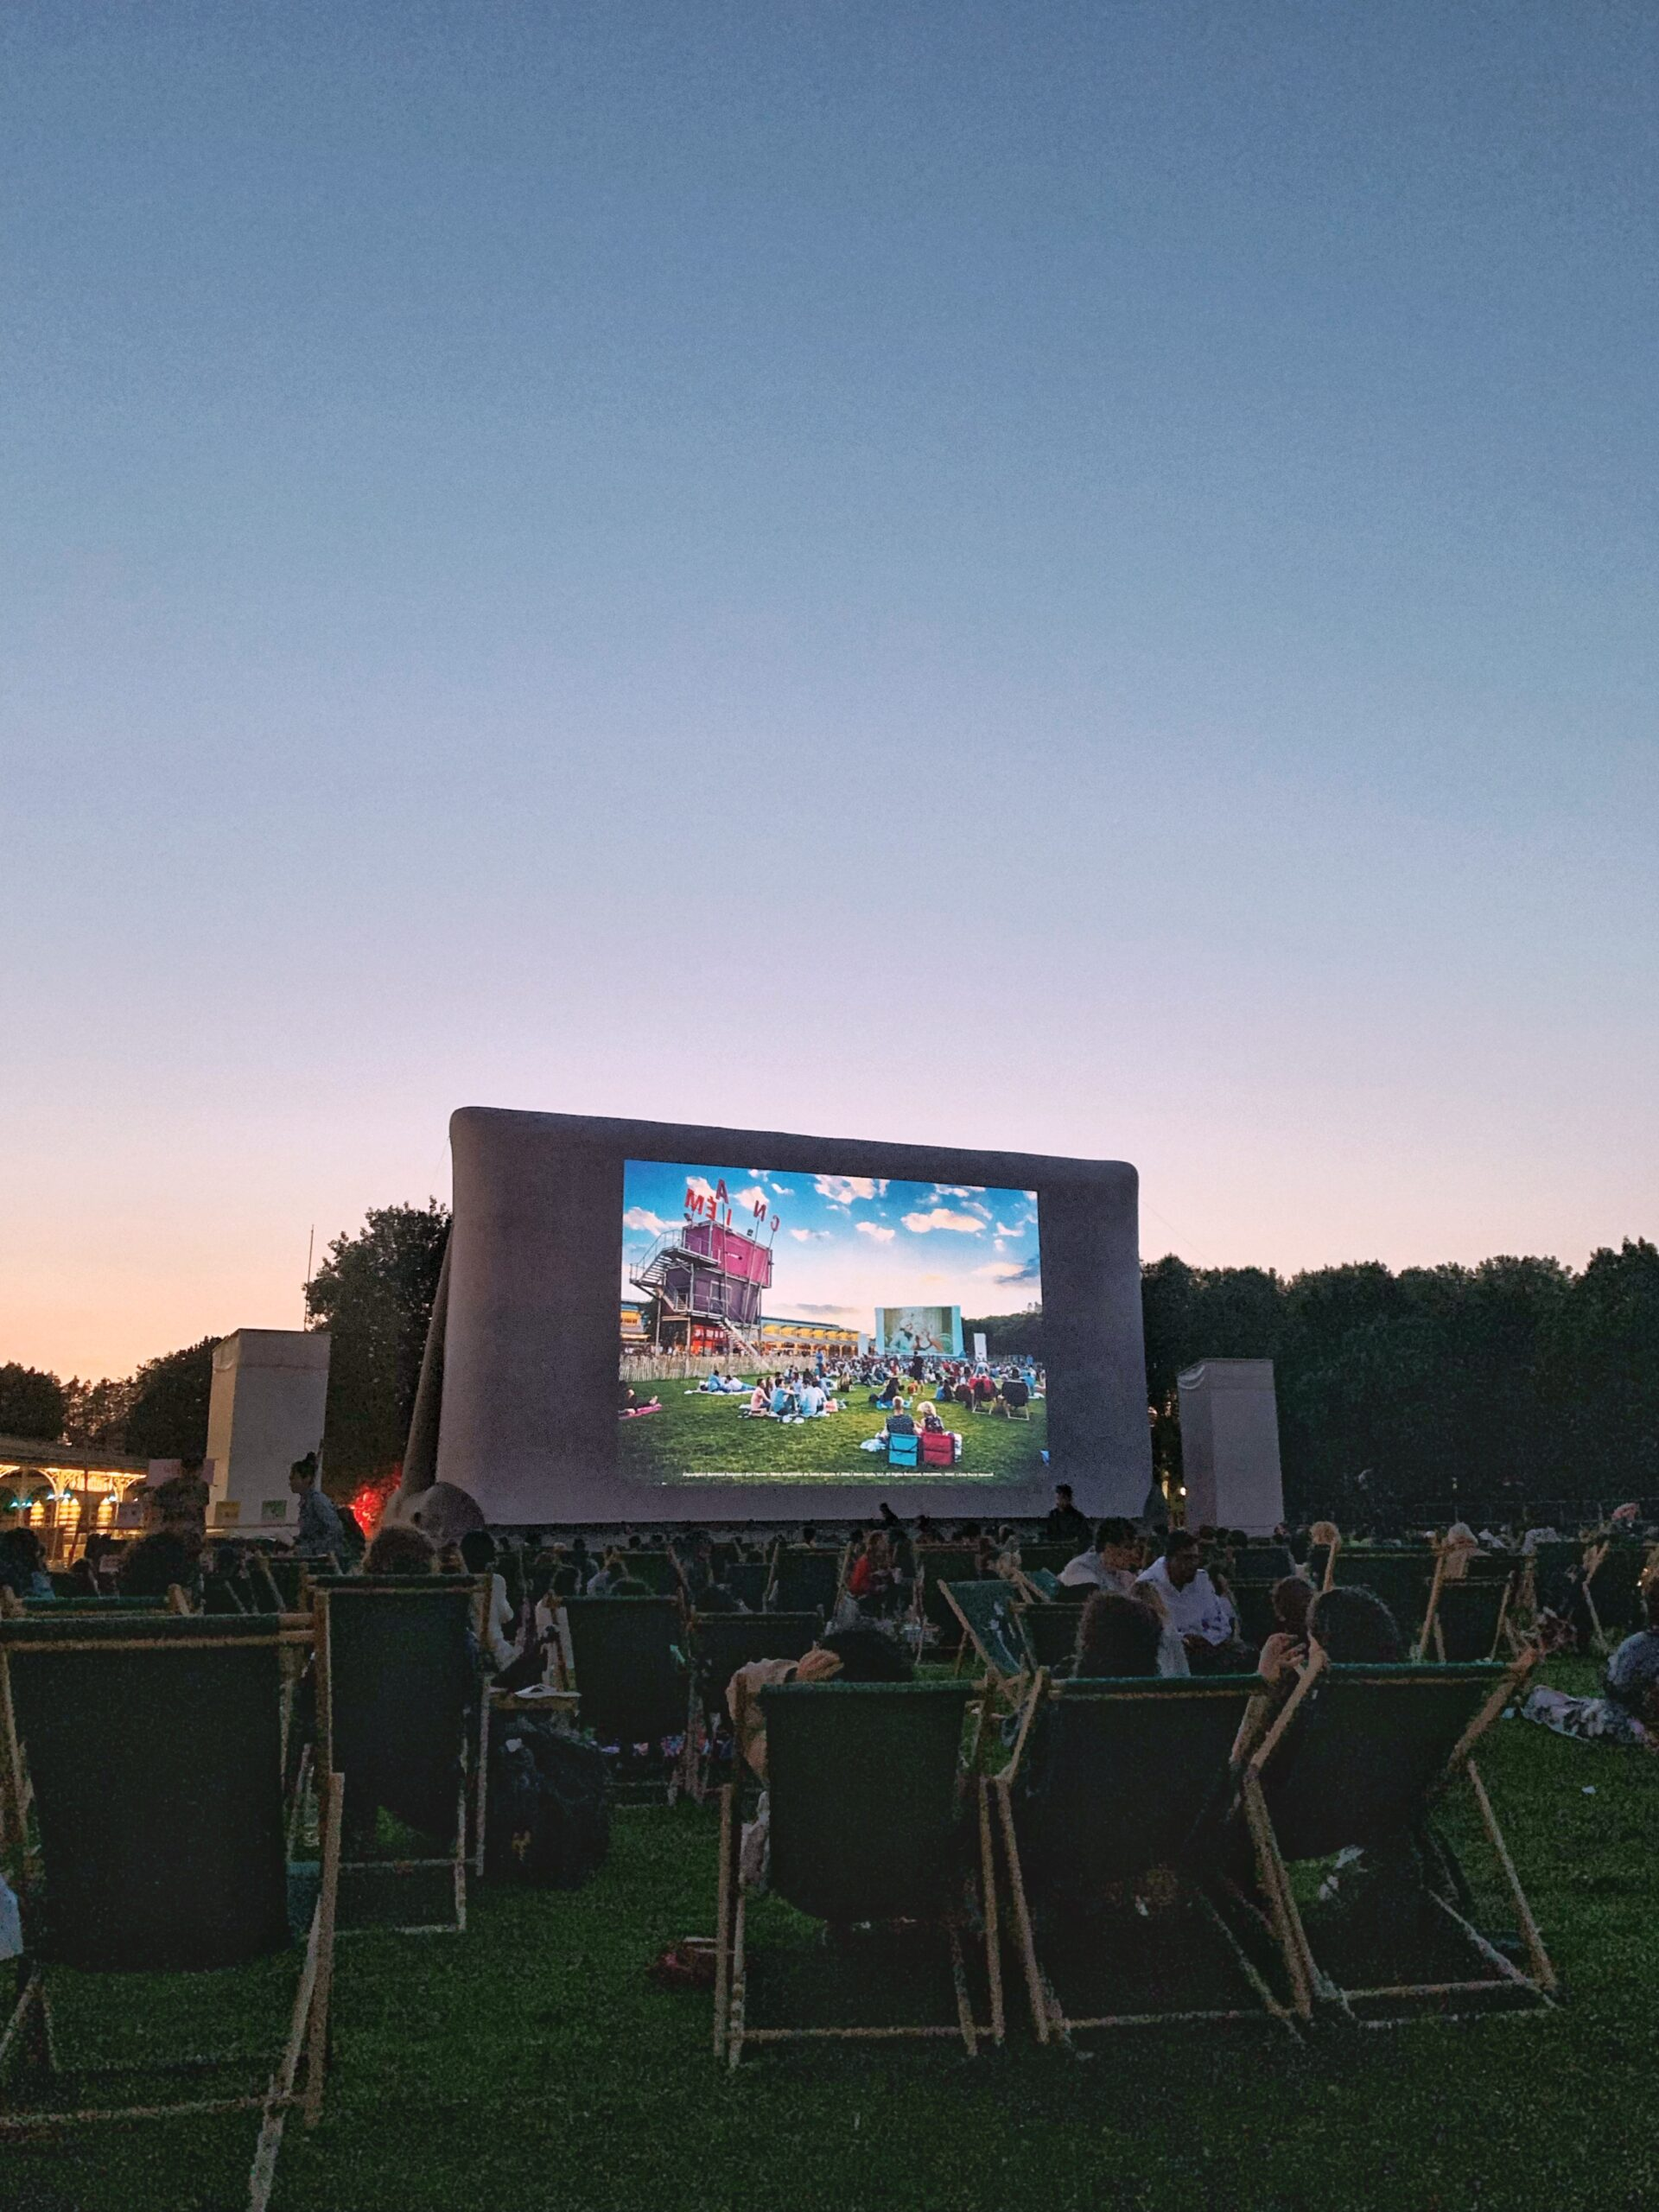 Best Outdoor Cinemas in Paris to Watch Movies for Free!